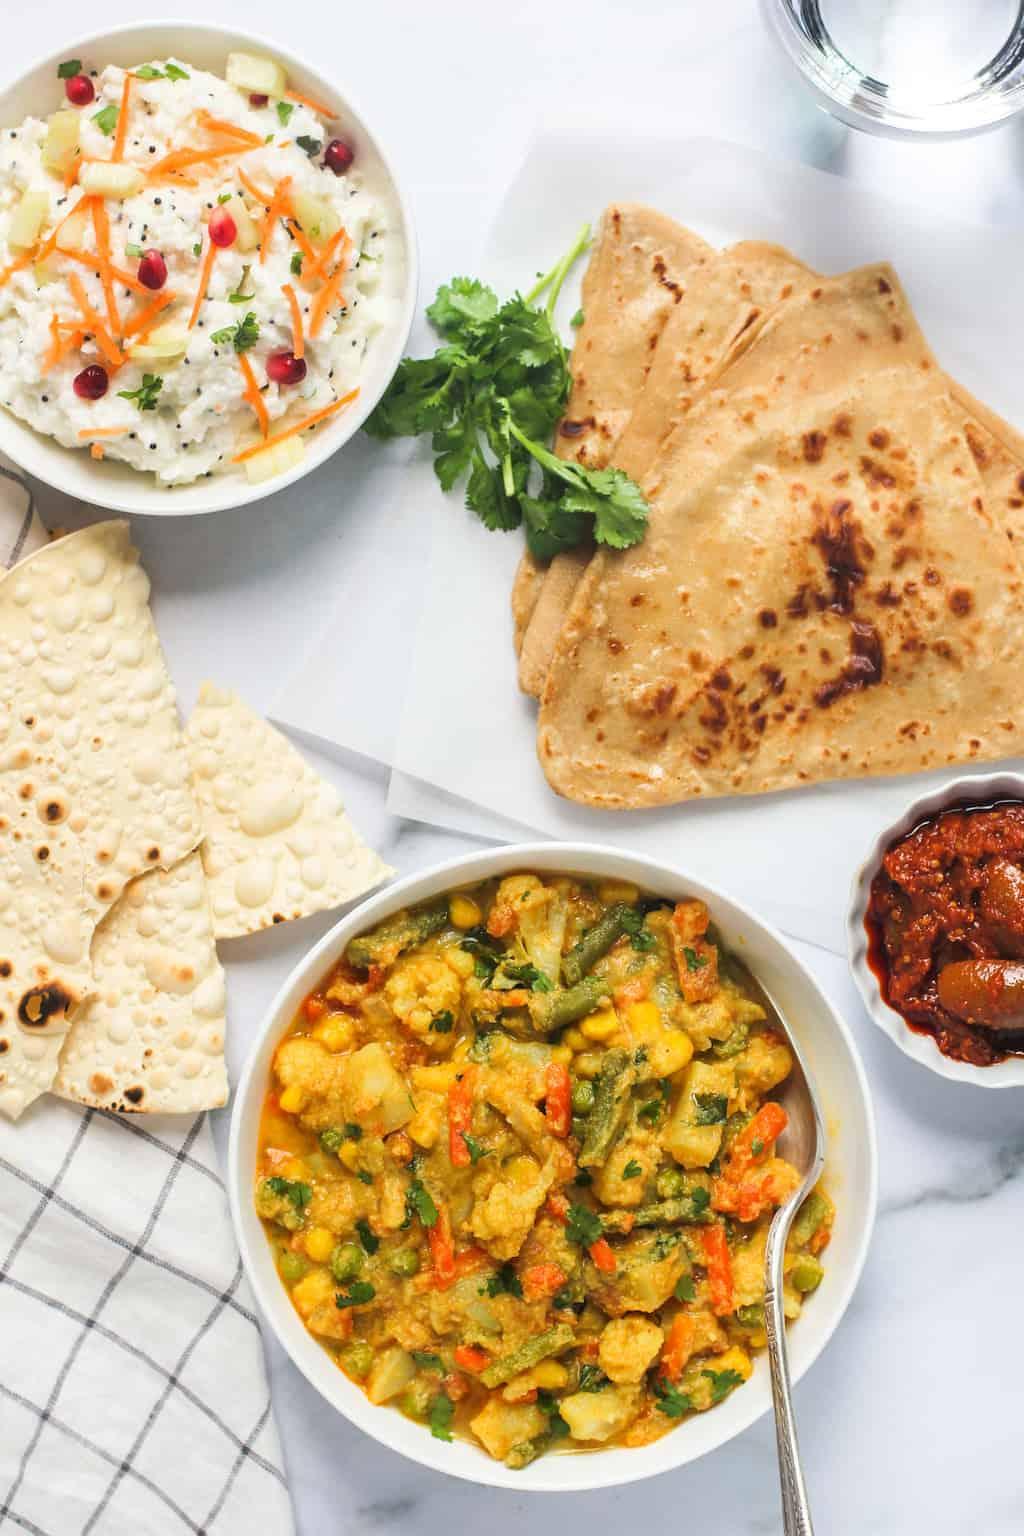 Veg Kurma served with parathas, rice and papad